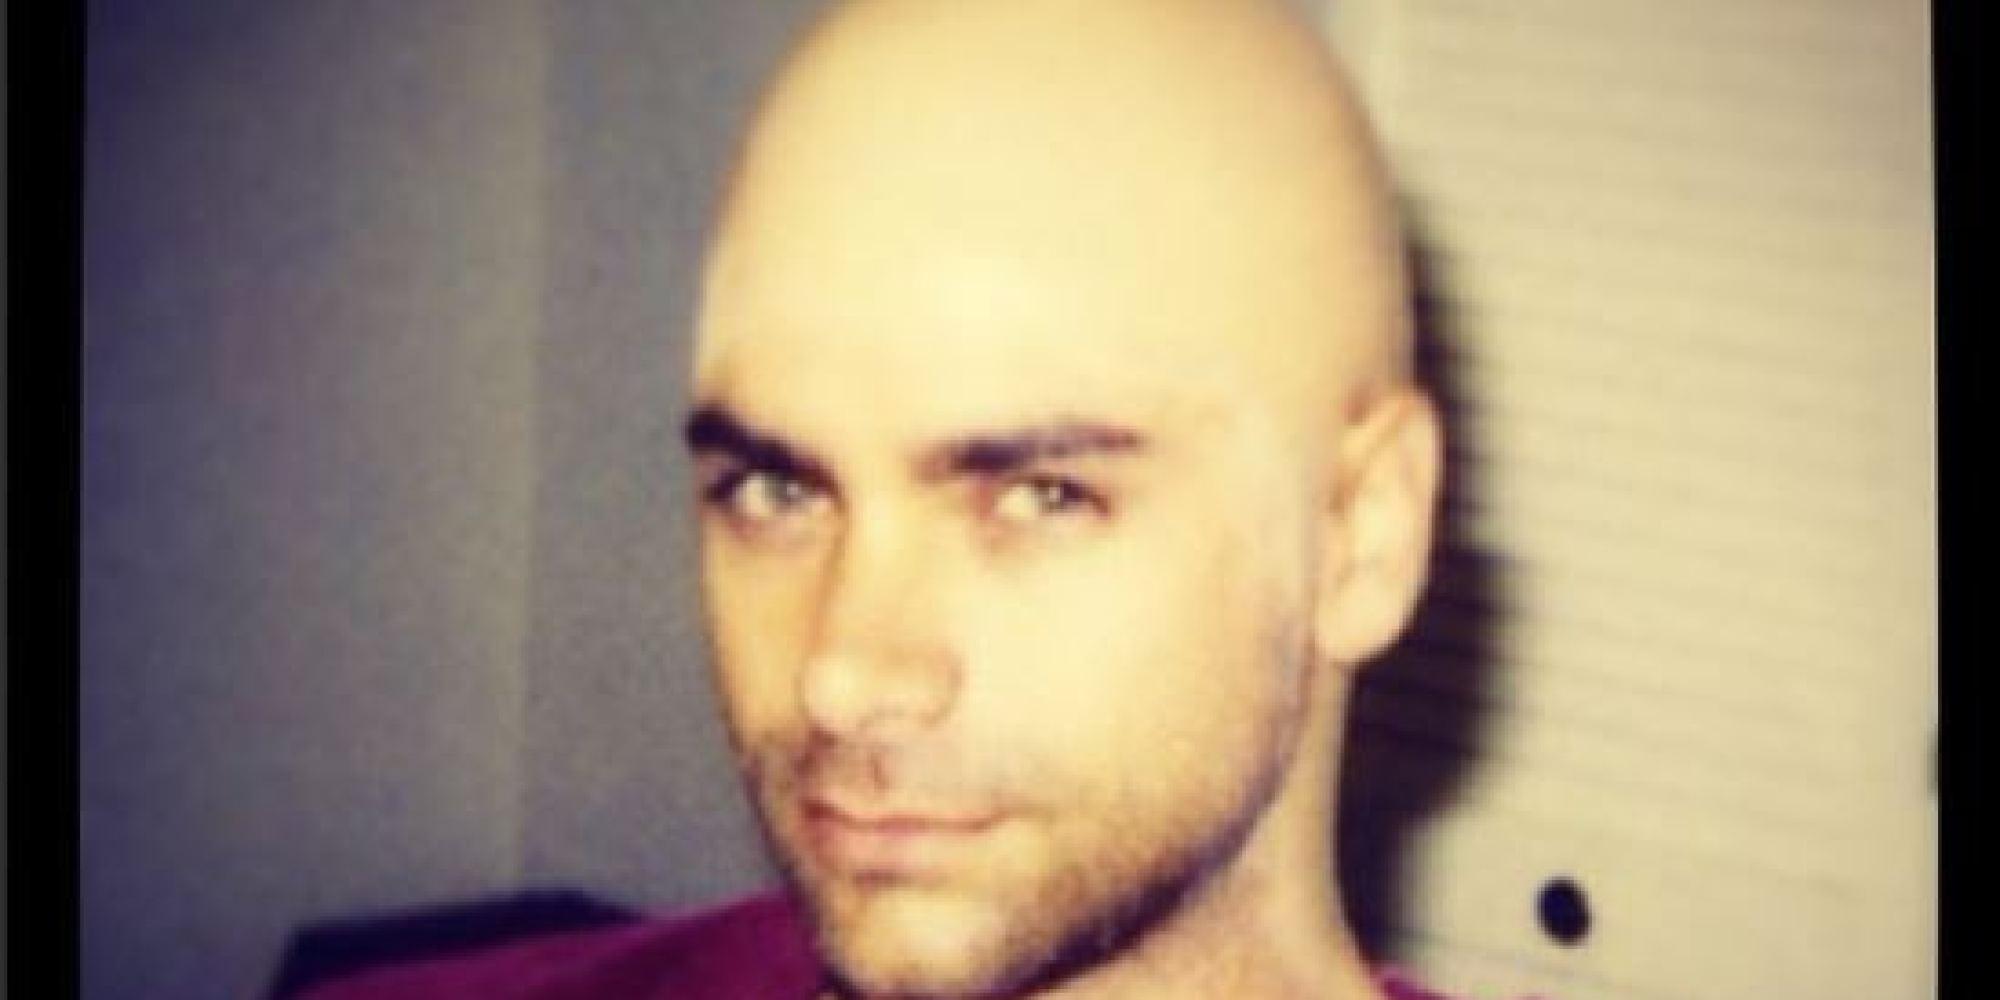 John Stamos Goes Bald In Latest Instagram Photo